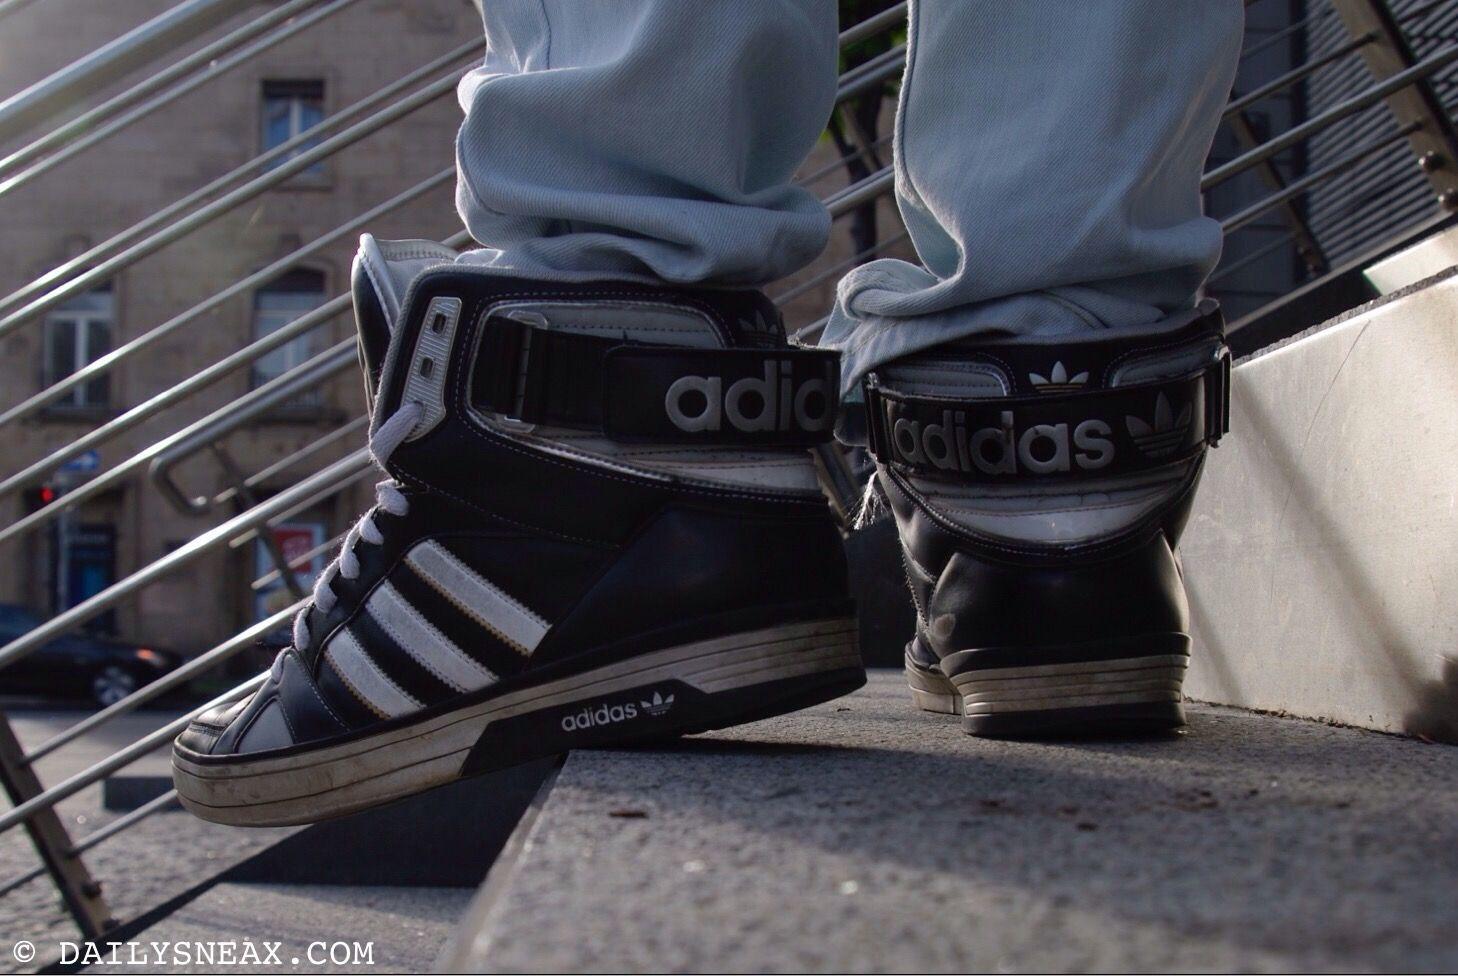 day 261: Adidas Spacediver #adidas #spacediver #adidasspacediver #sneakers - DAILYSNEAX